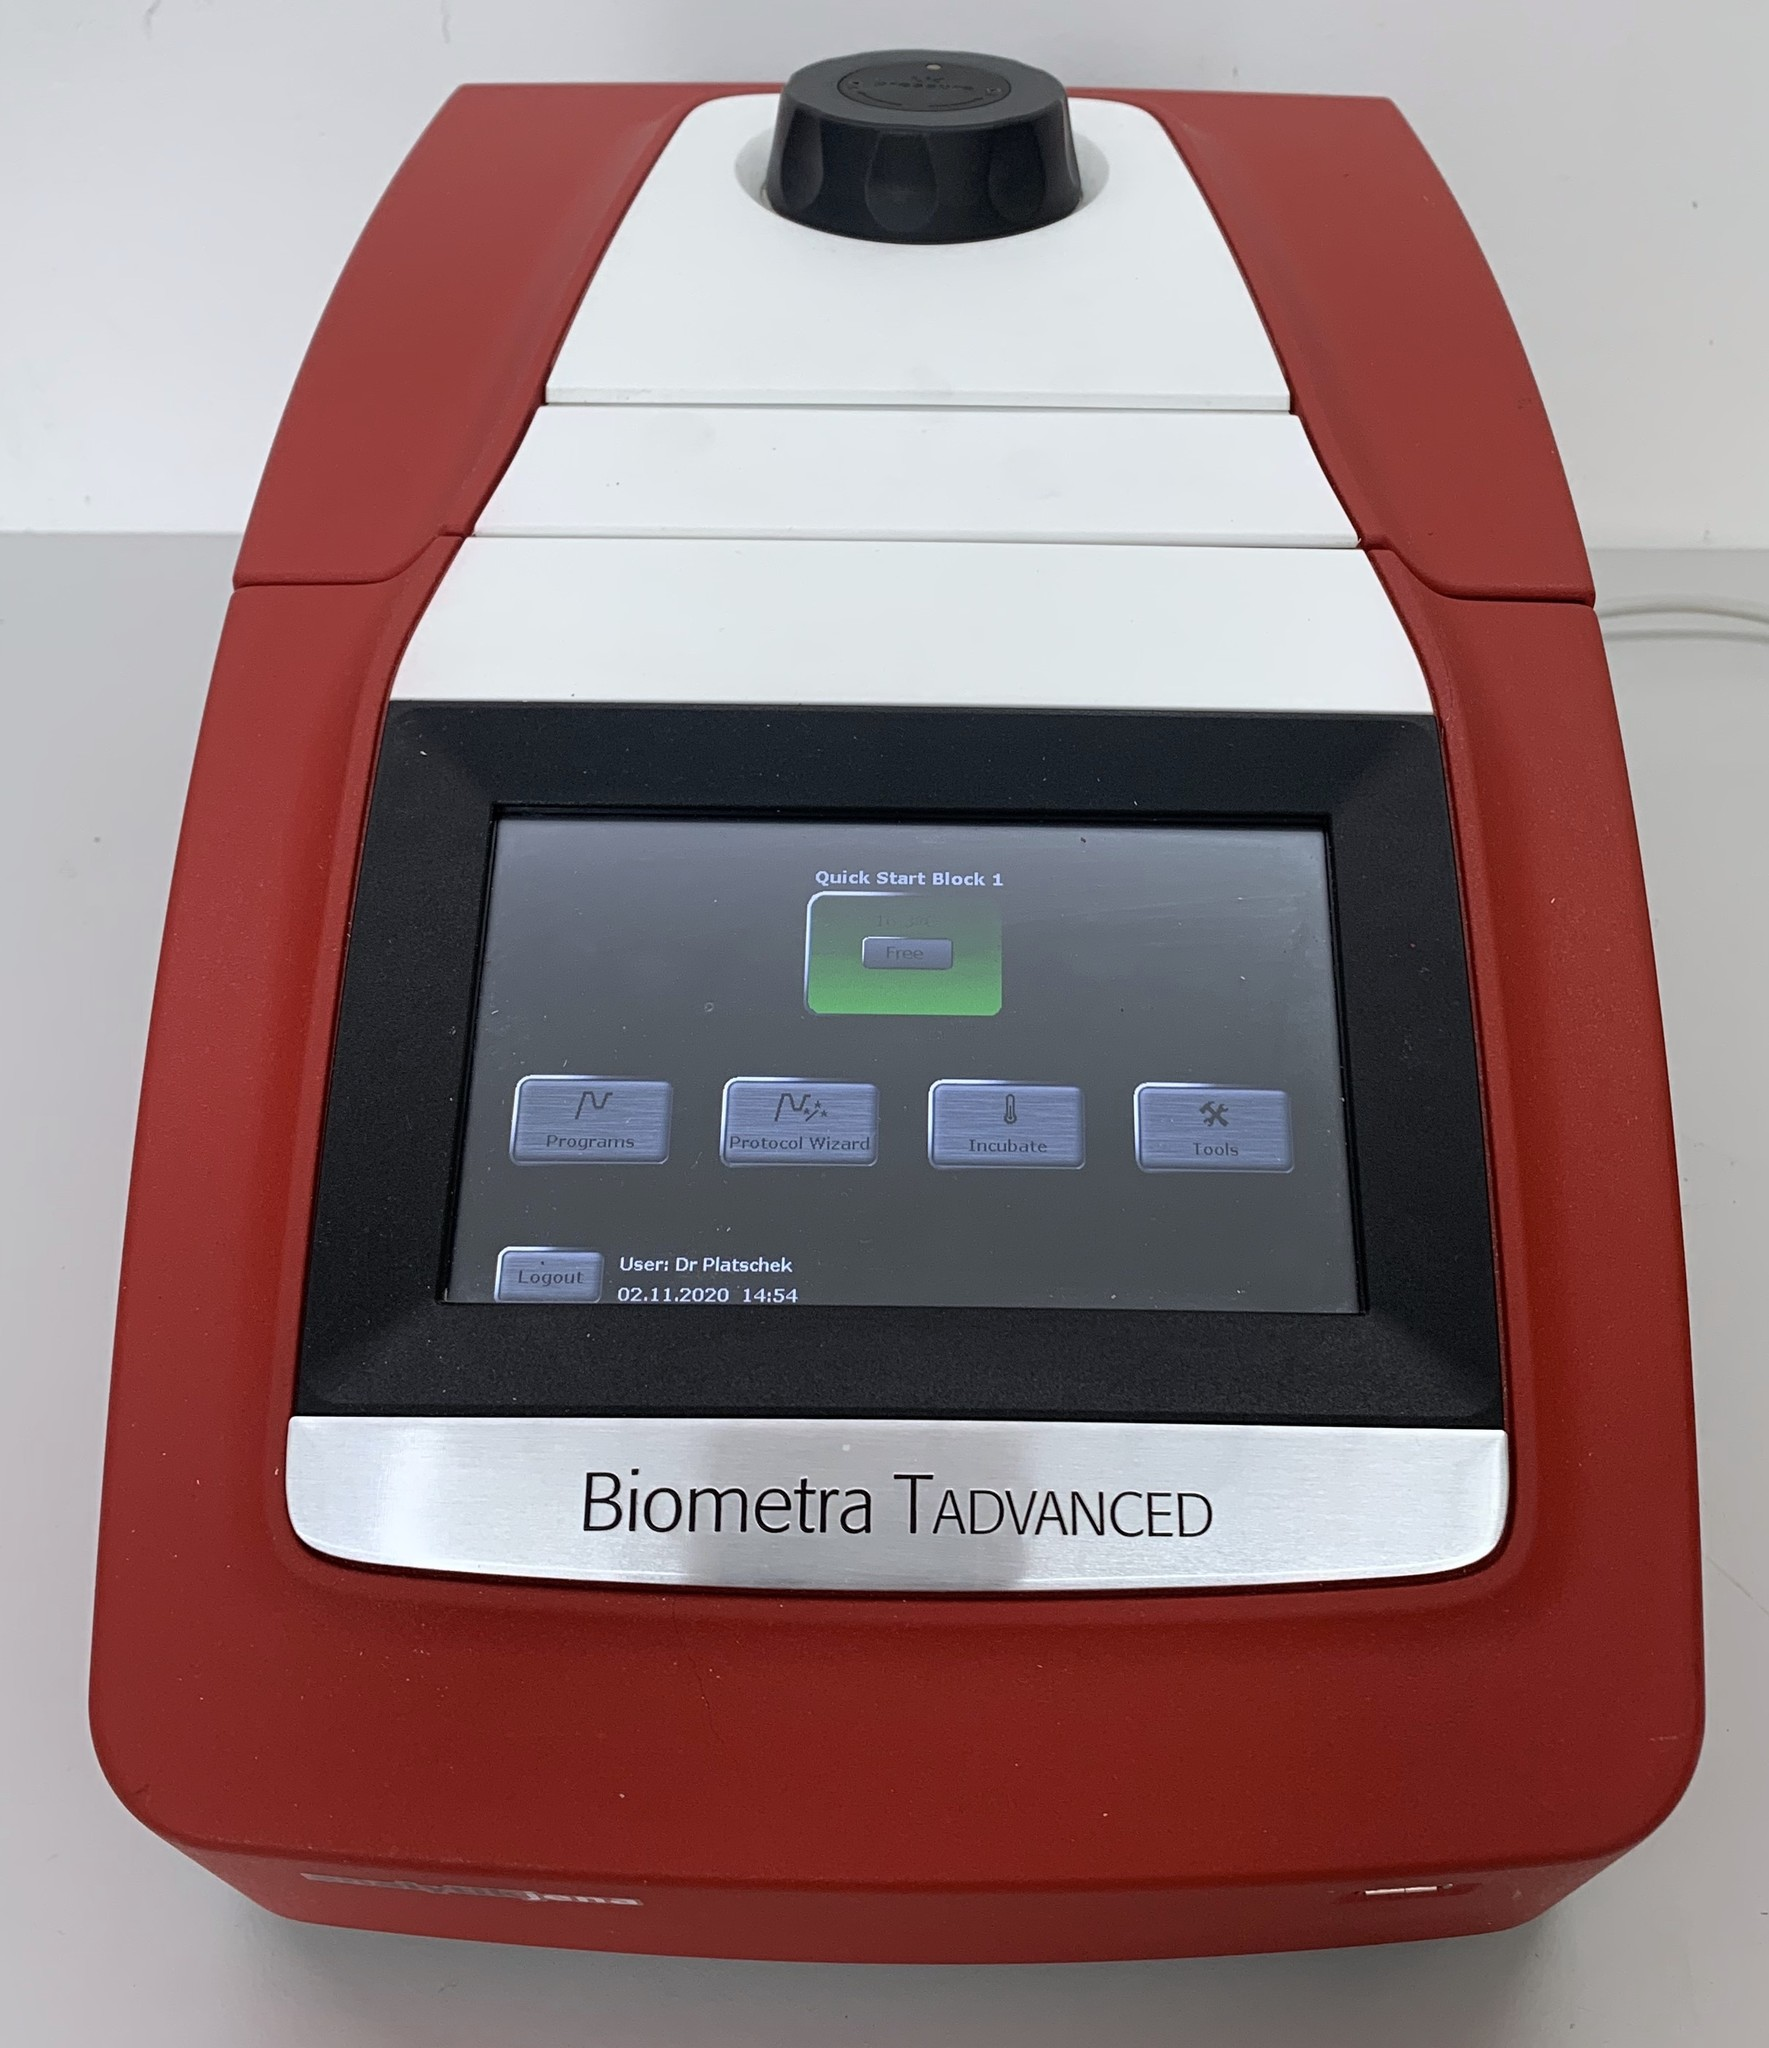 Biometra Biometra TAdvanced 96 Thermocycler